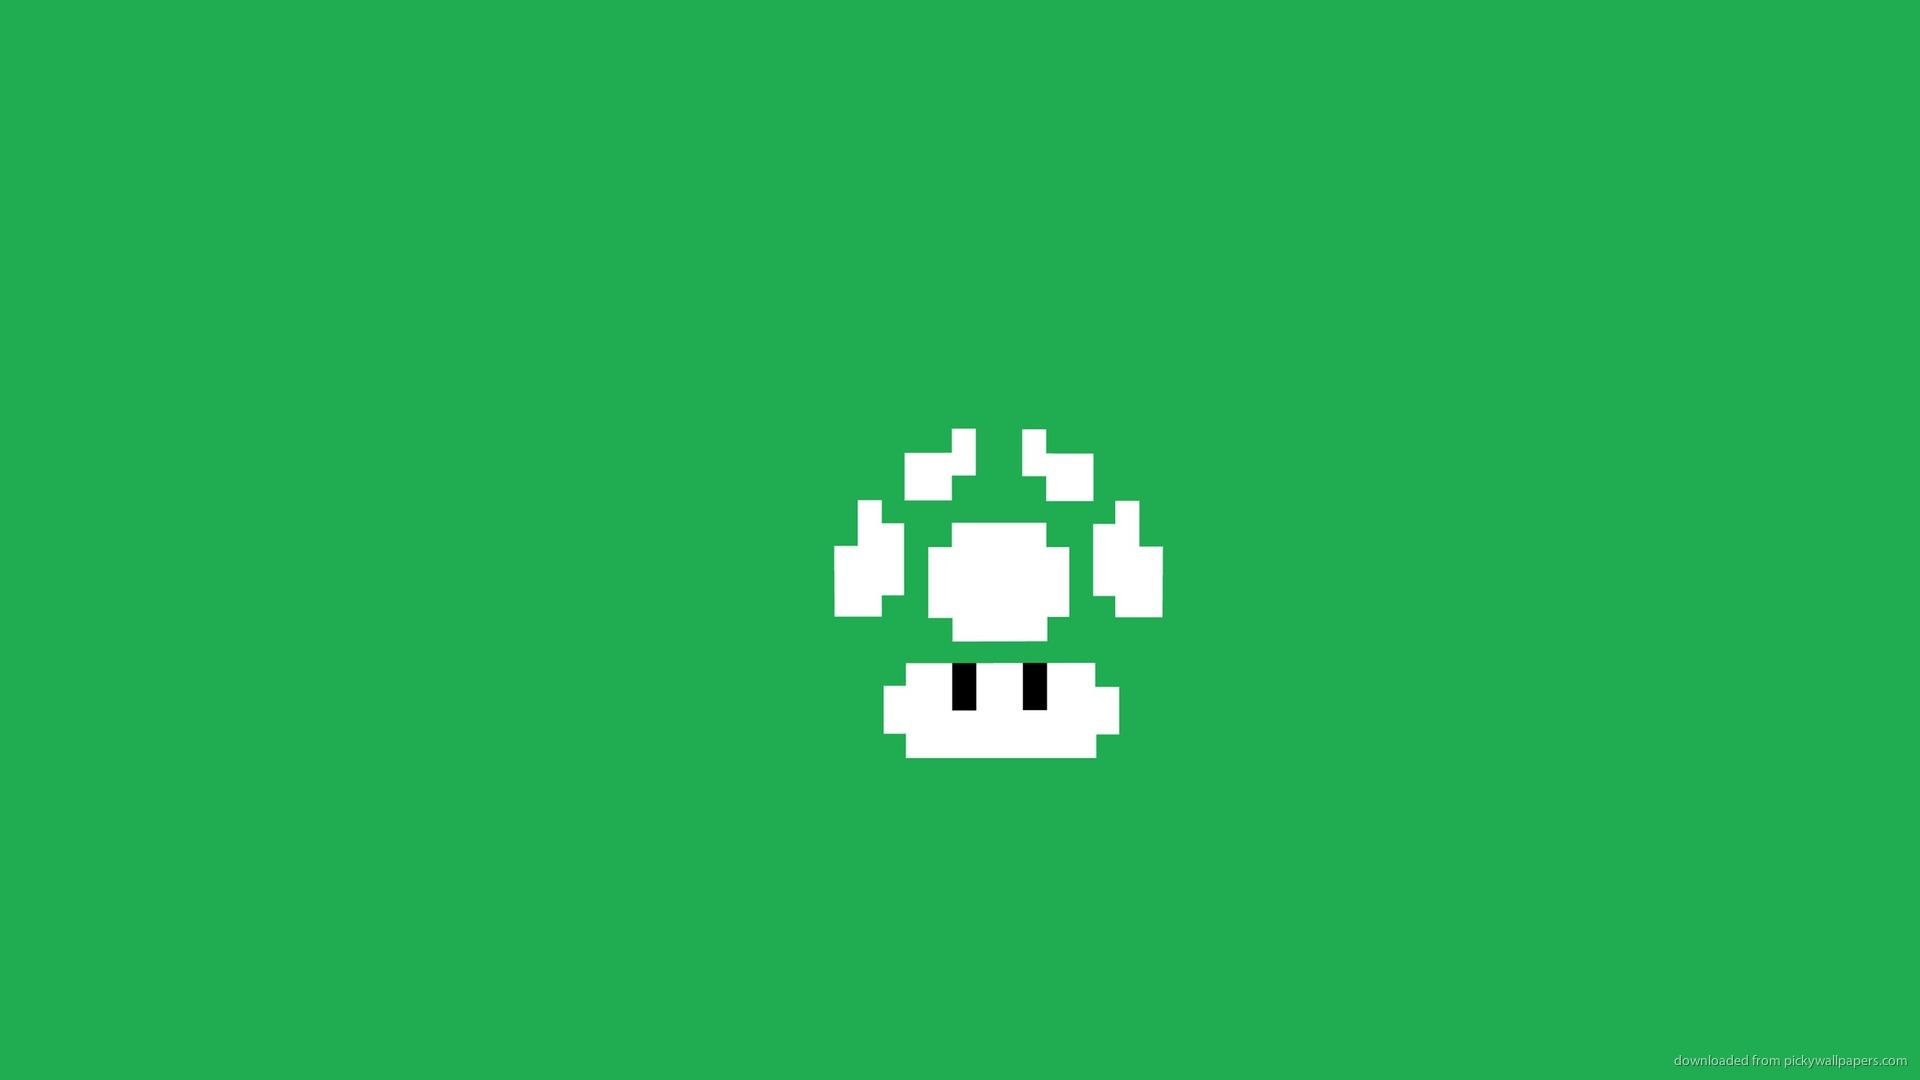 green-mushroom-for-iphone-green-mushroom-1920%C3%971080-wallpaper-wp3406432